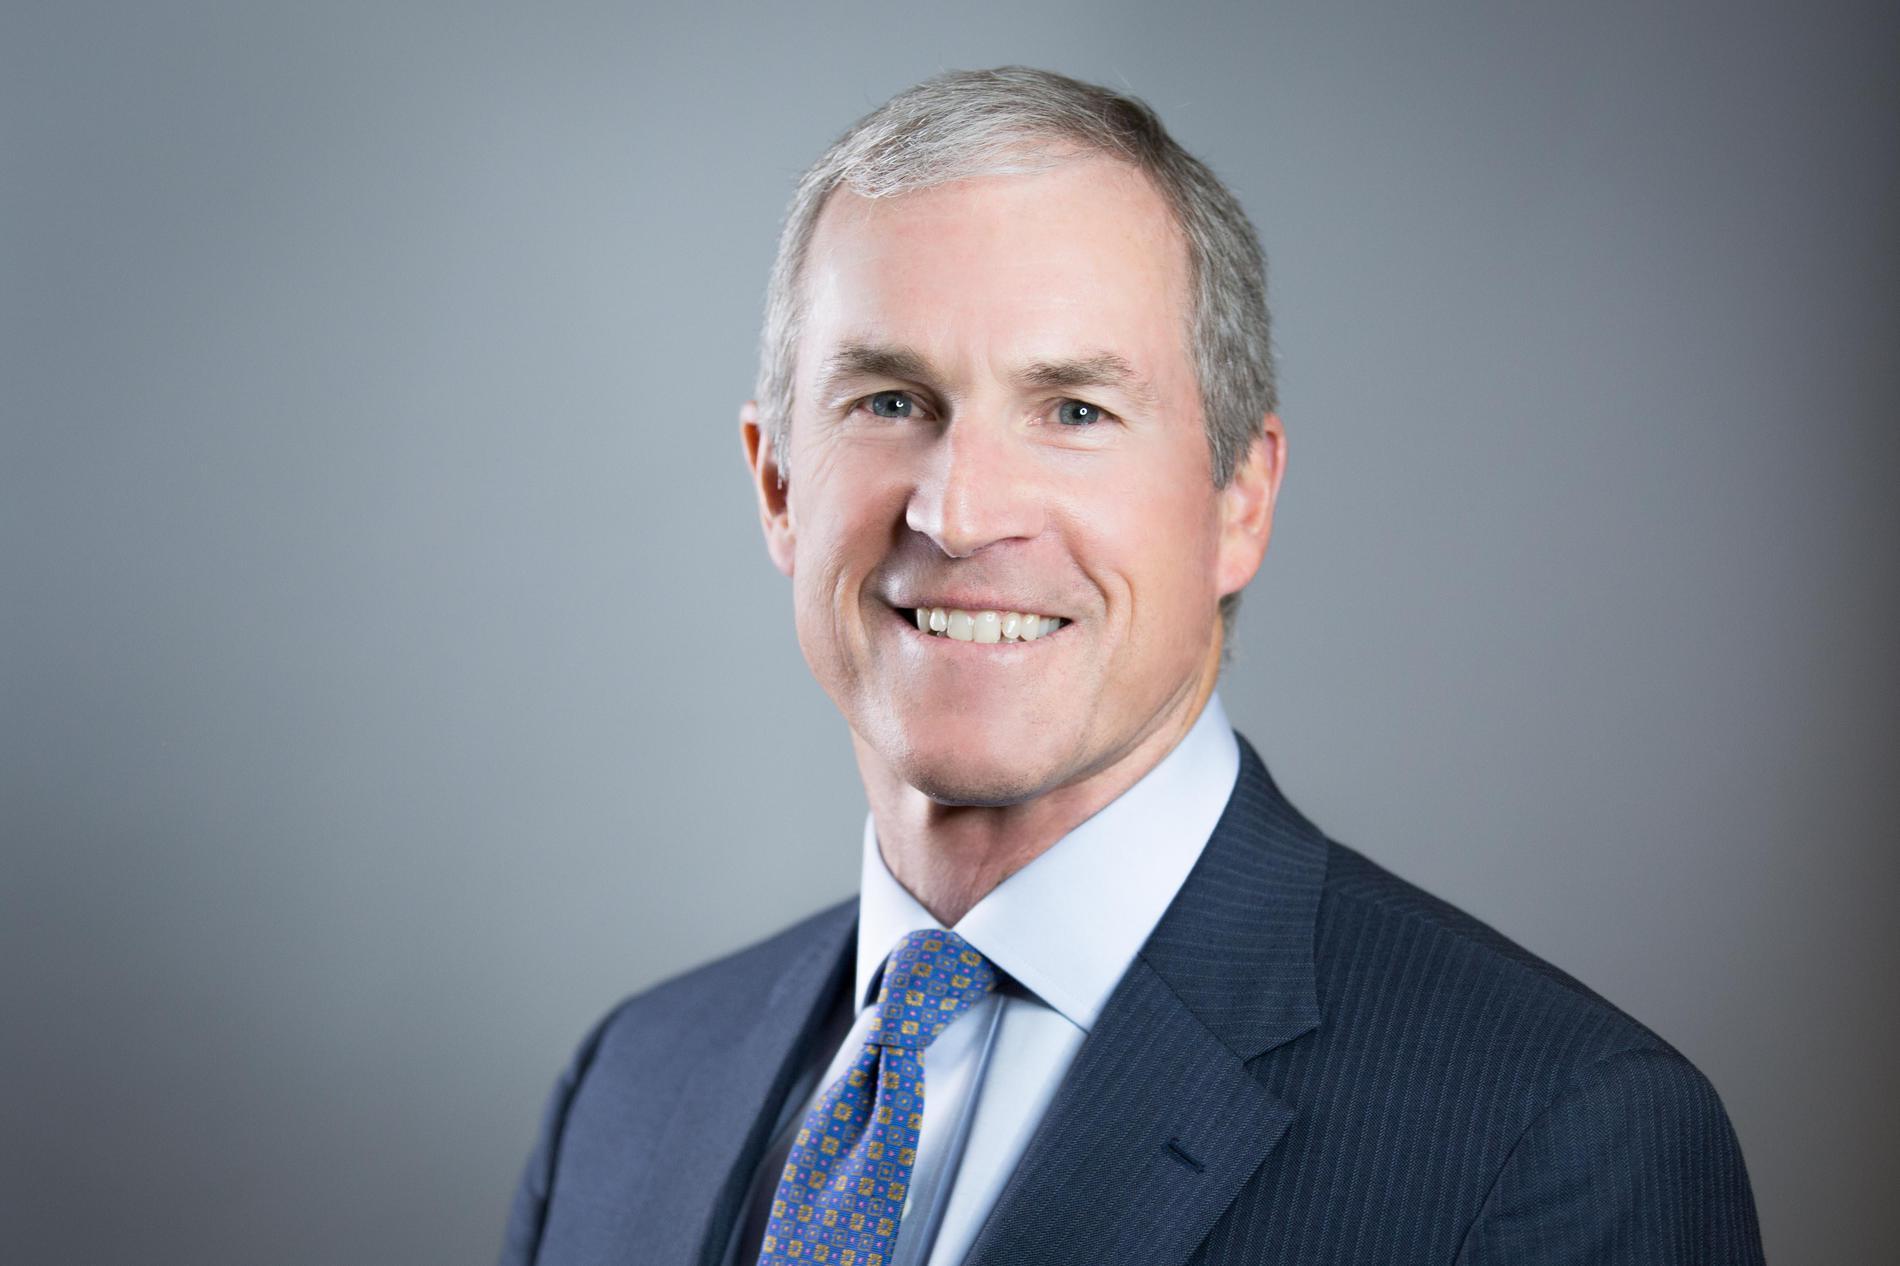 Kurt Burkhard | San Francisco, CA | Morgan Stanley Wealth Management